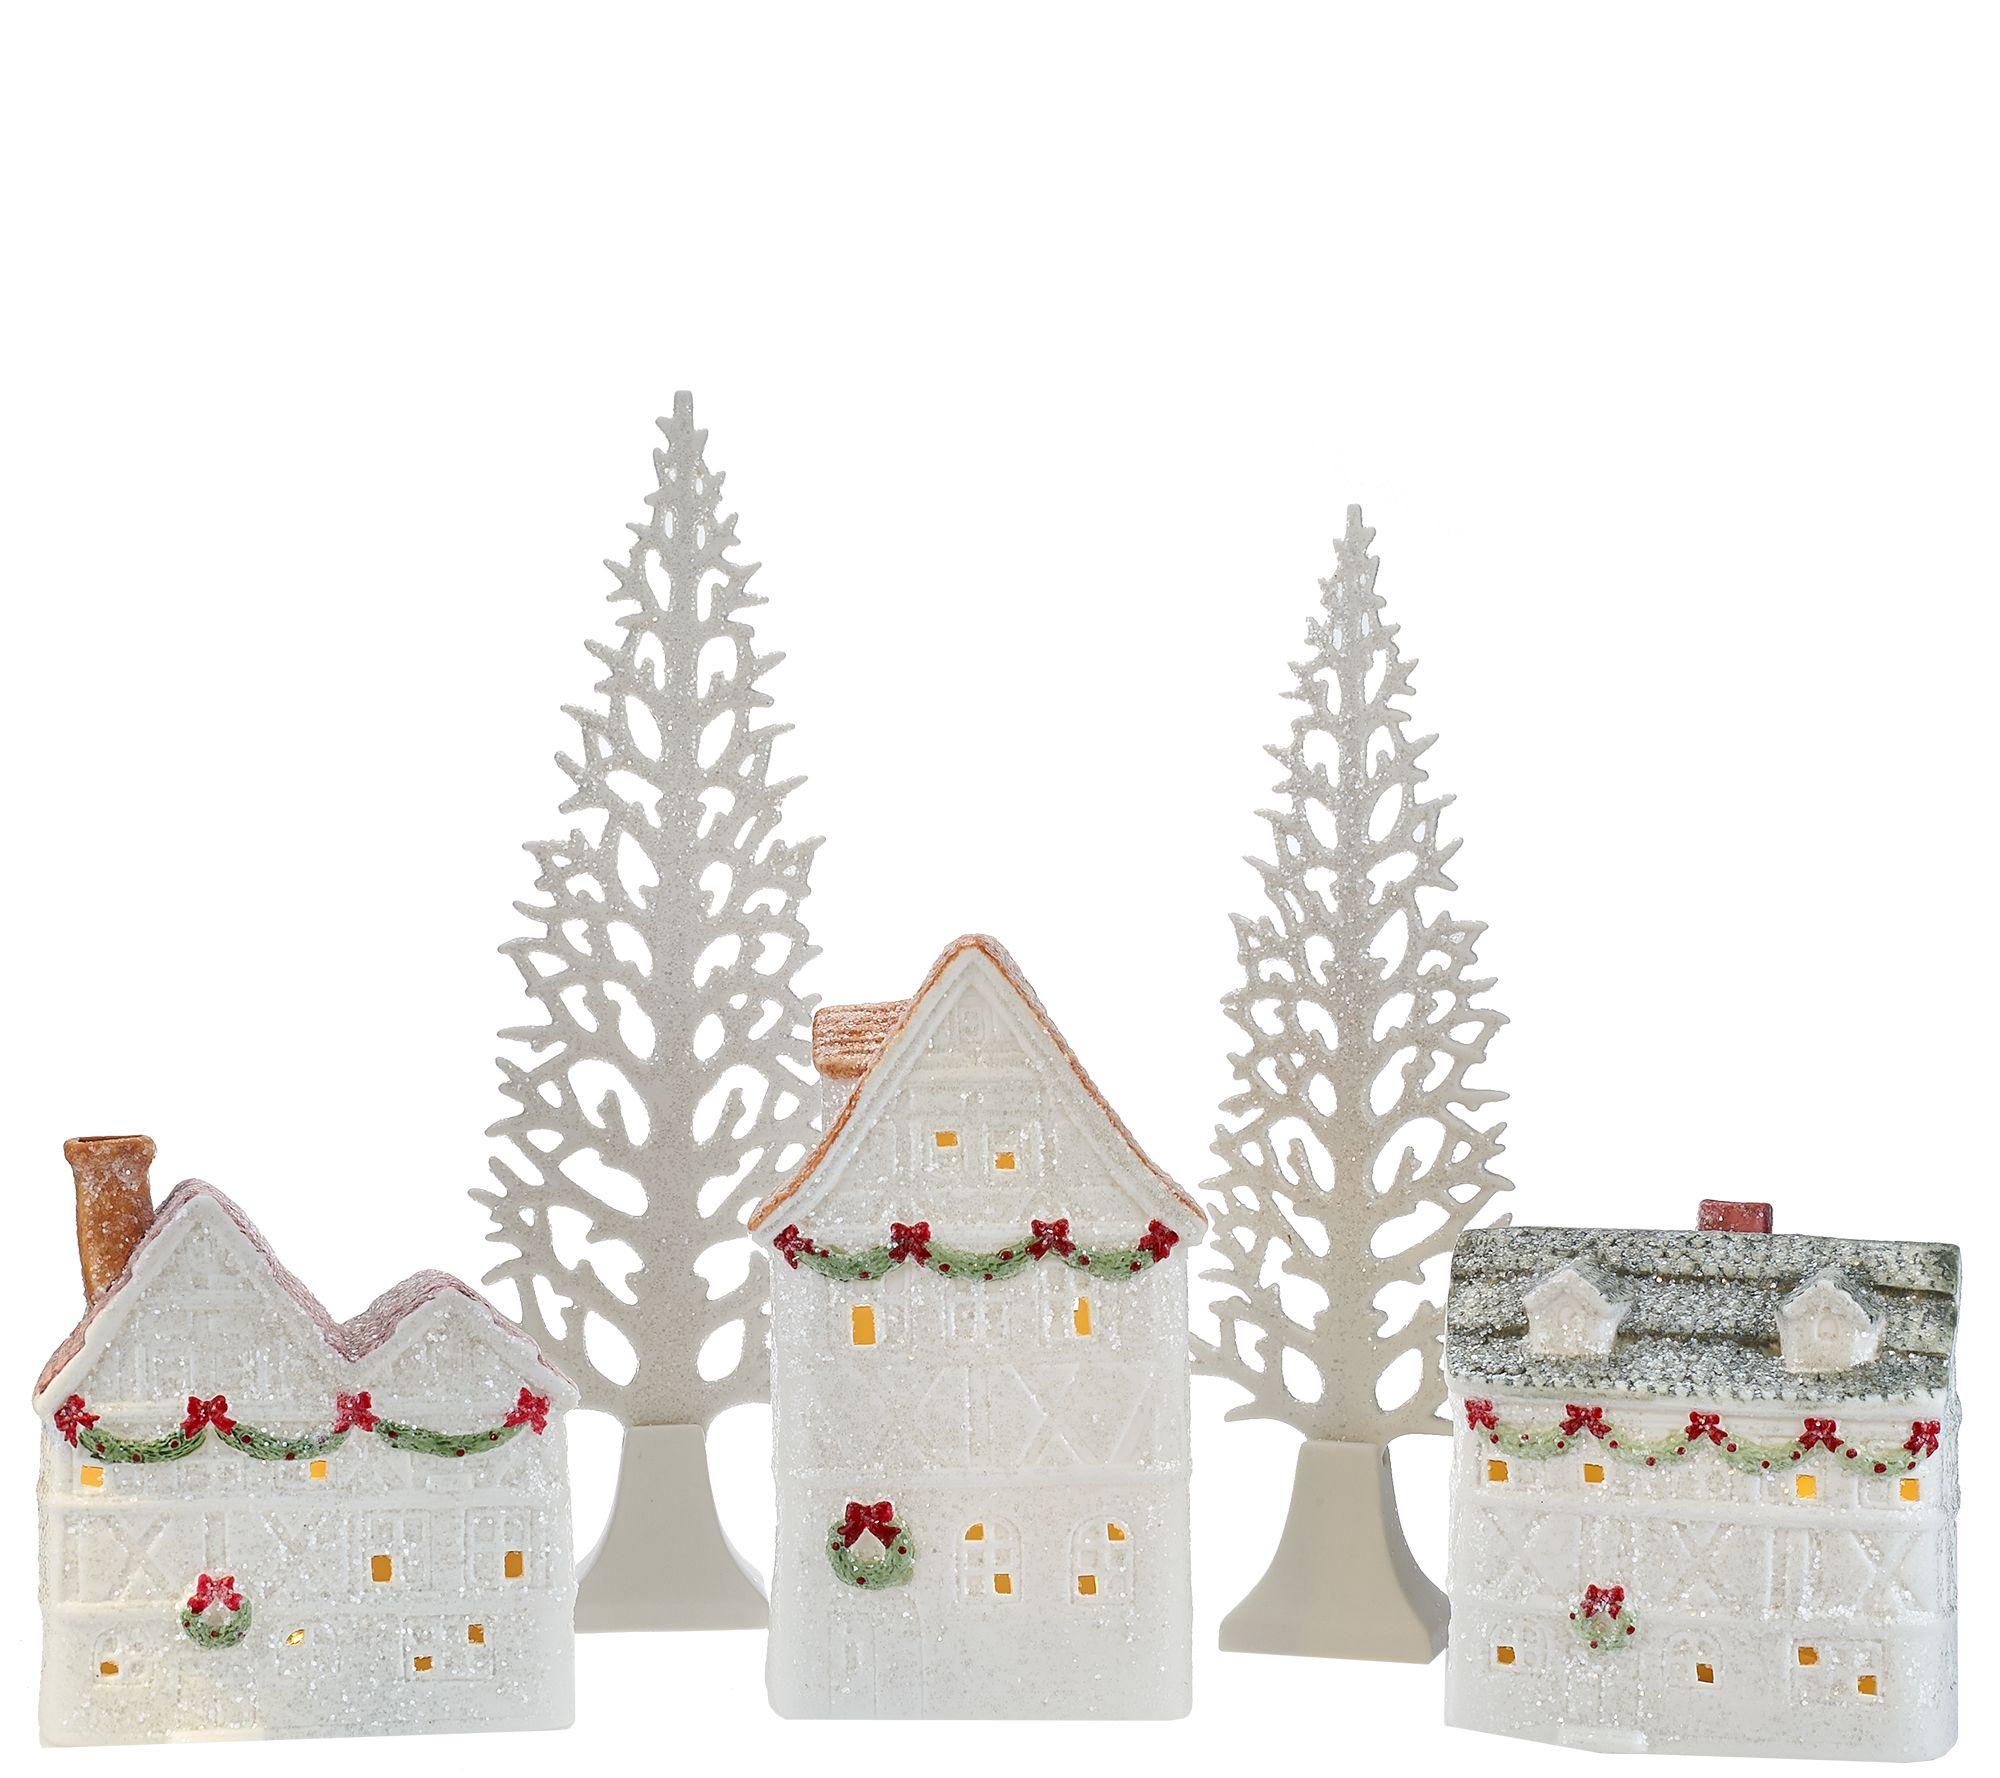 5-piece Illuminated Glittered Ceramic Village By Valerie